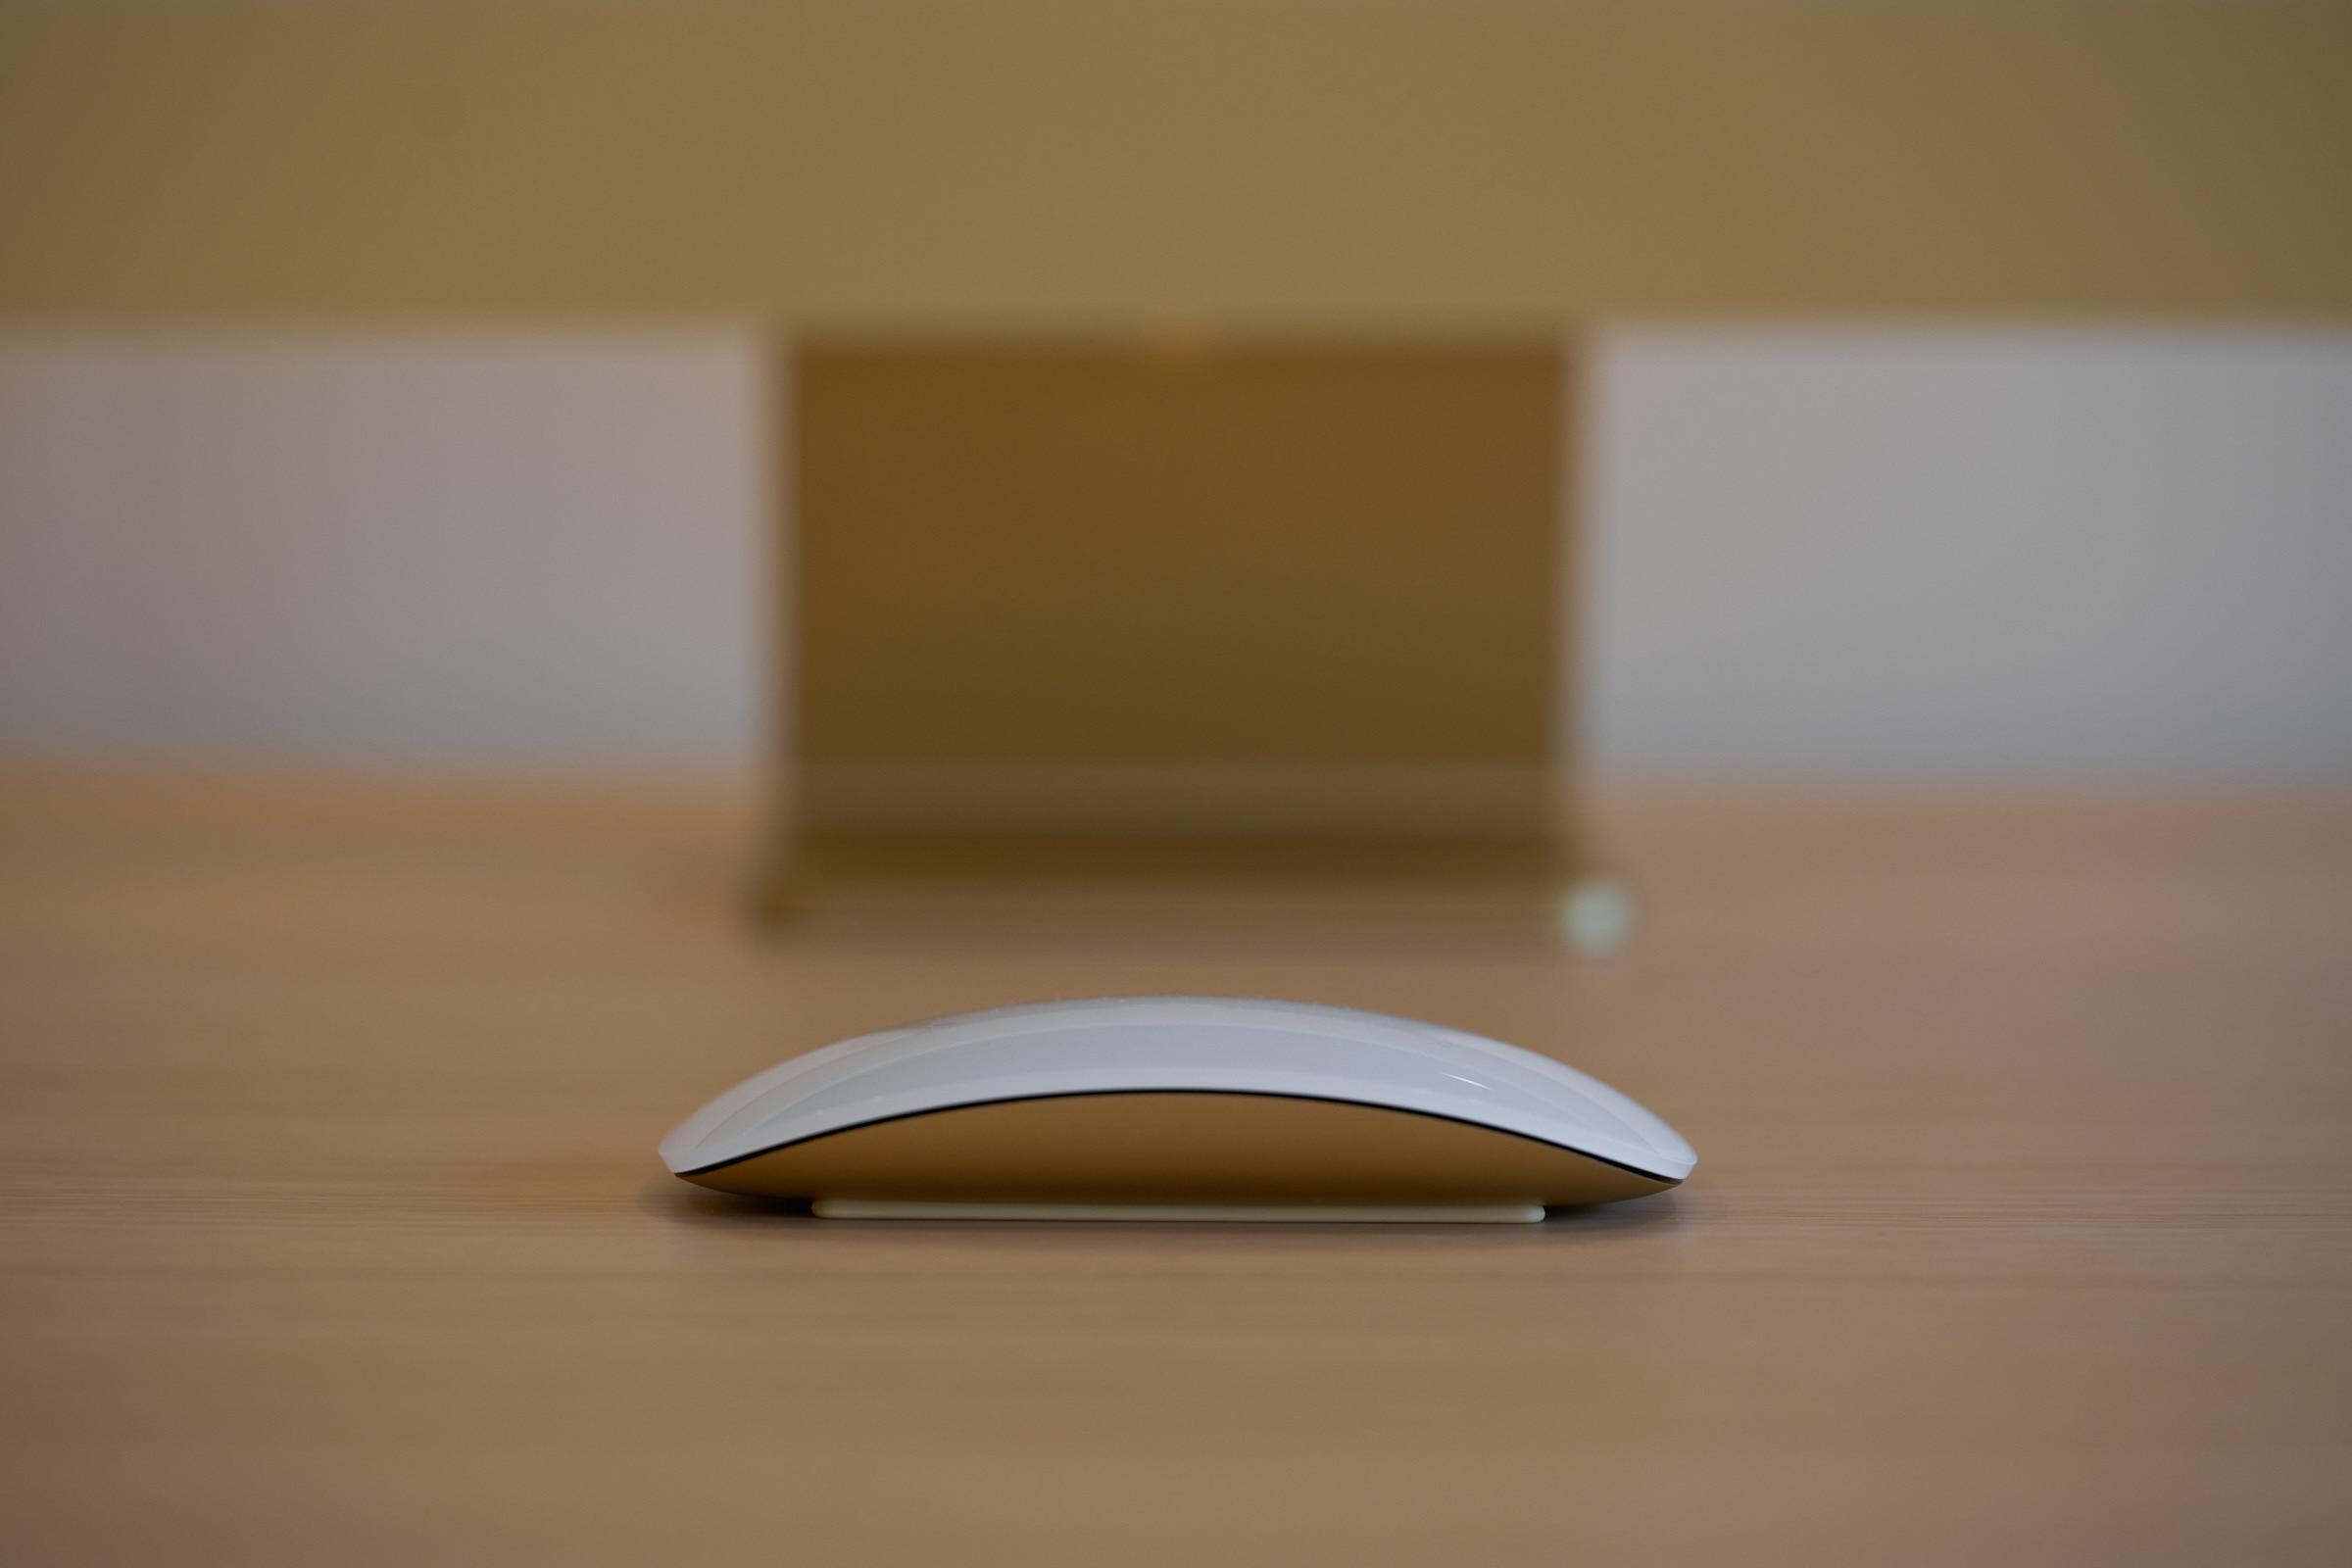 "New 24"" Apple iMac Mouse"